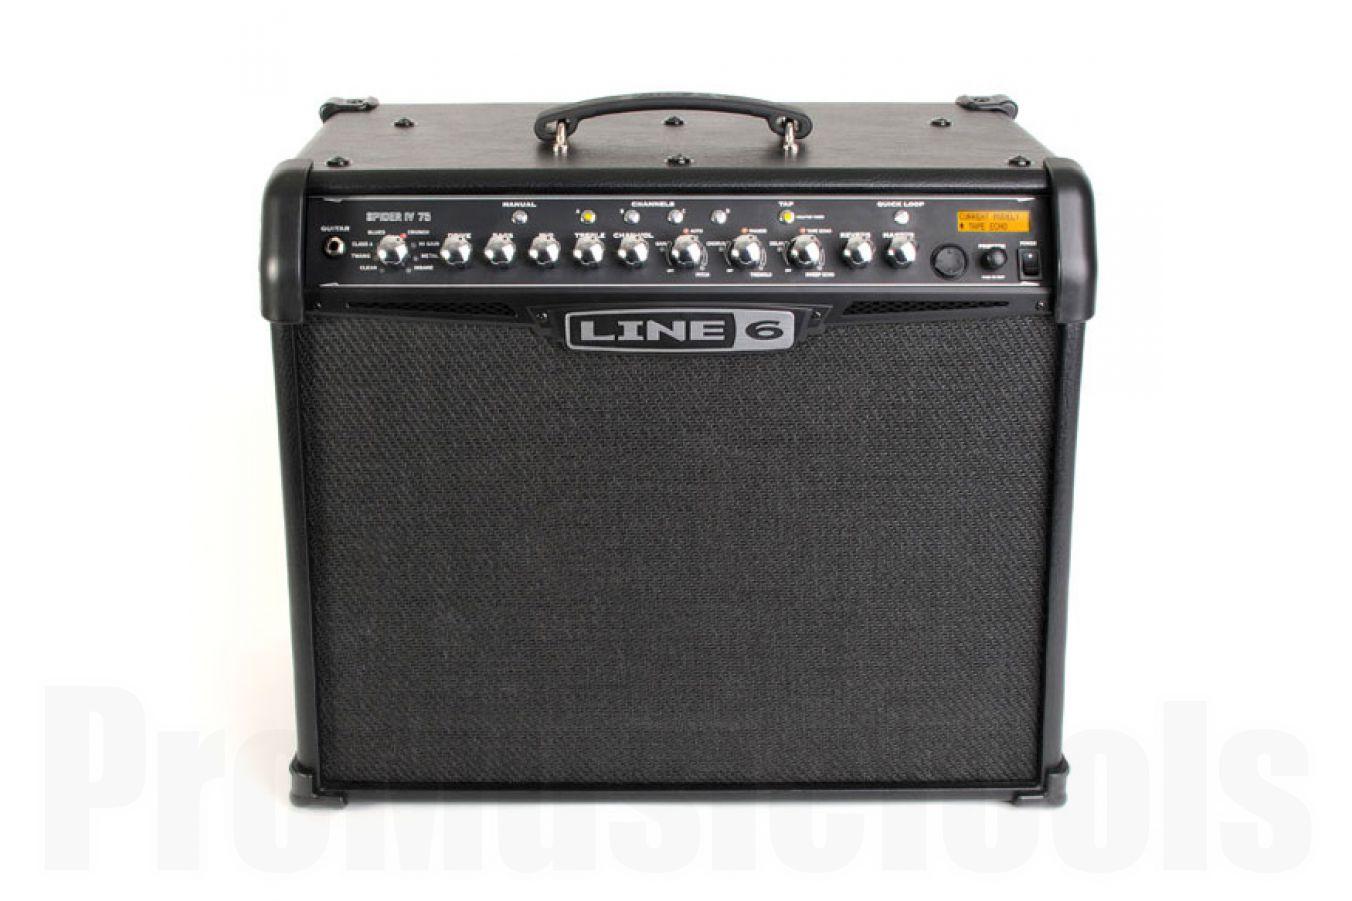 Line6 Spider IV 75 combo modeling amp